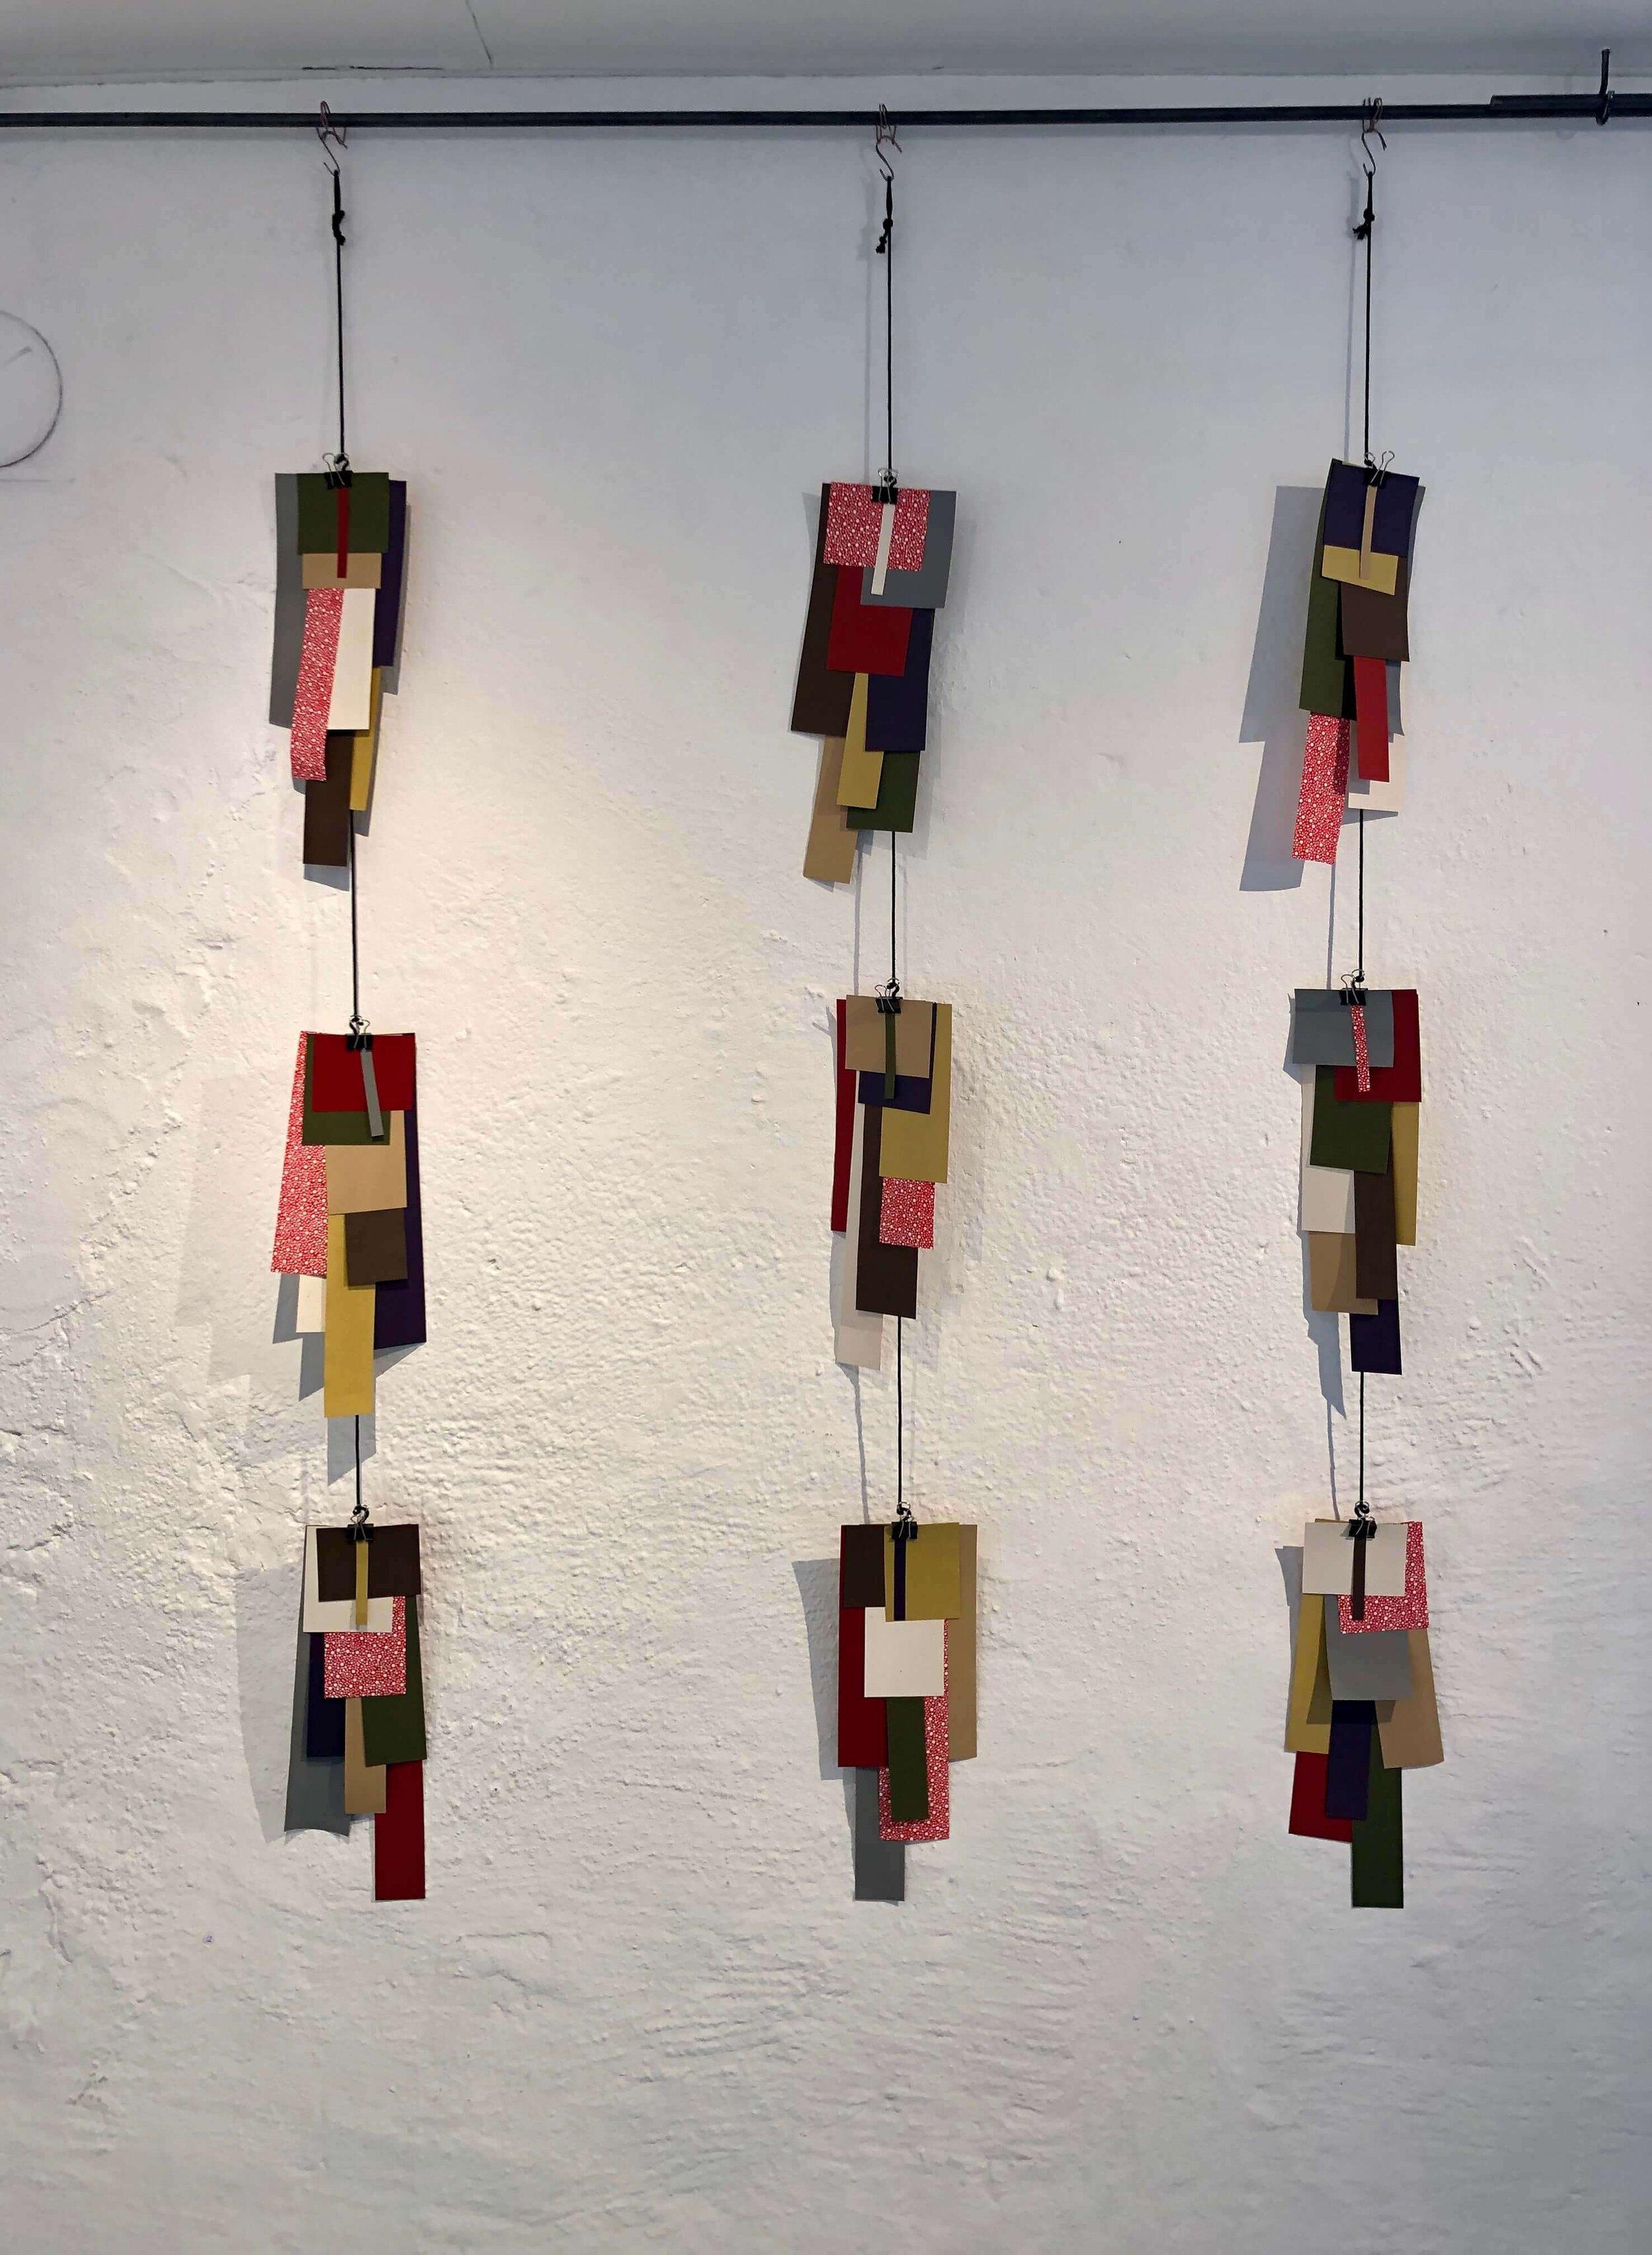 Linda-Allard-Forsman--Tomas-Robefelt--papper--sadelmakarlangan--2019--20.jpg